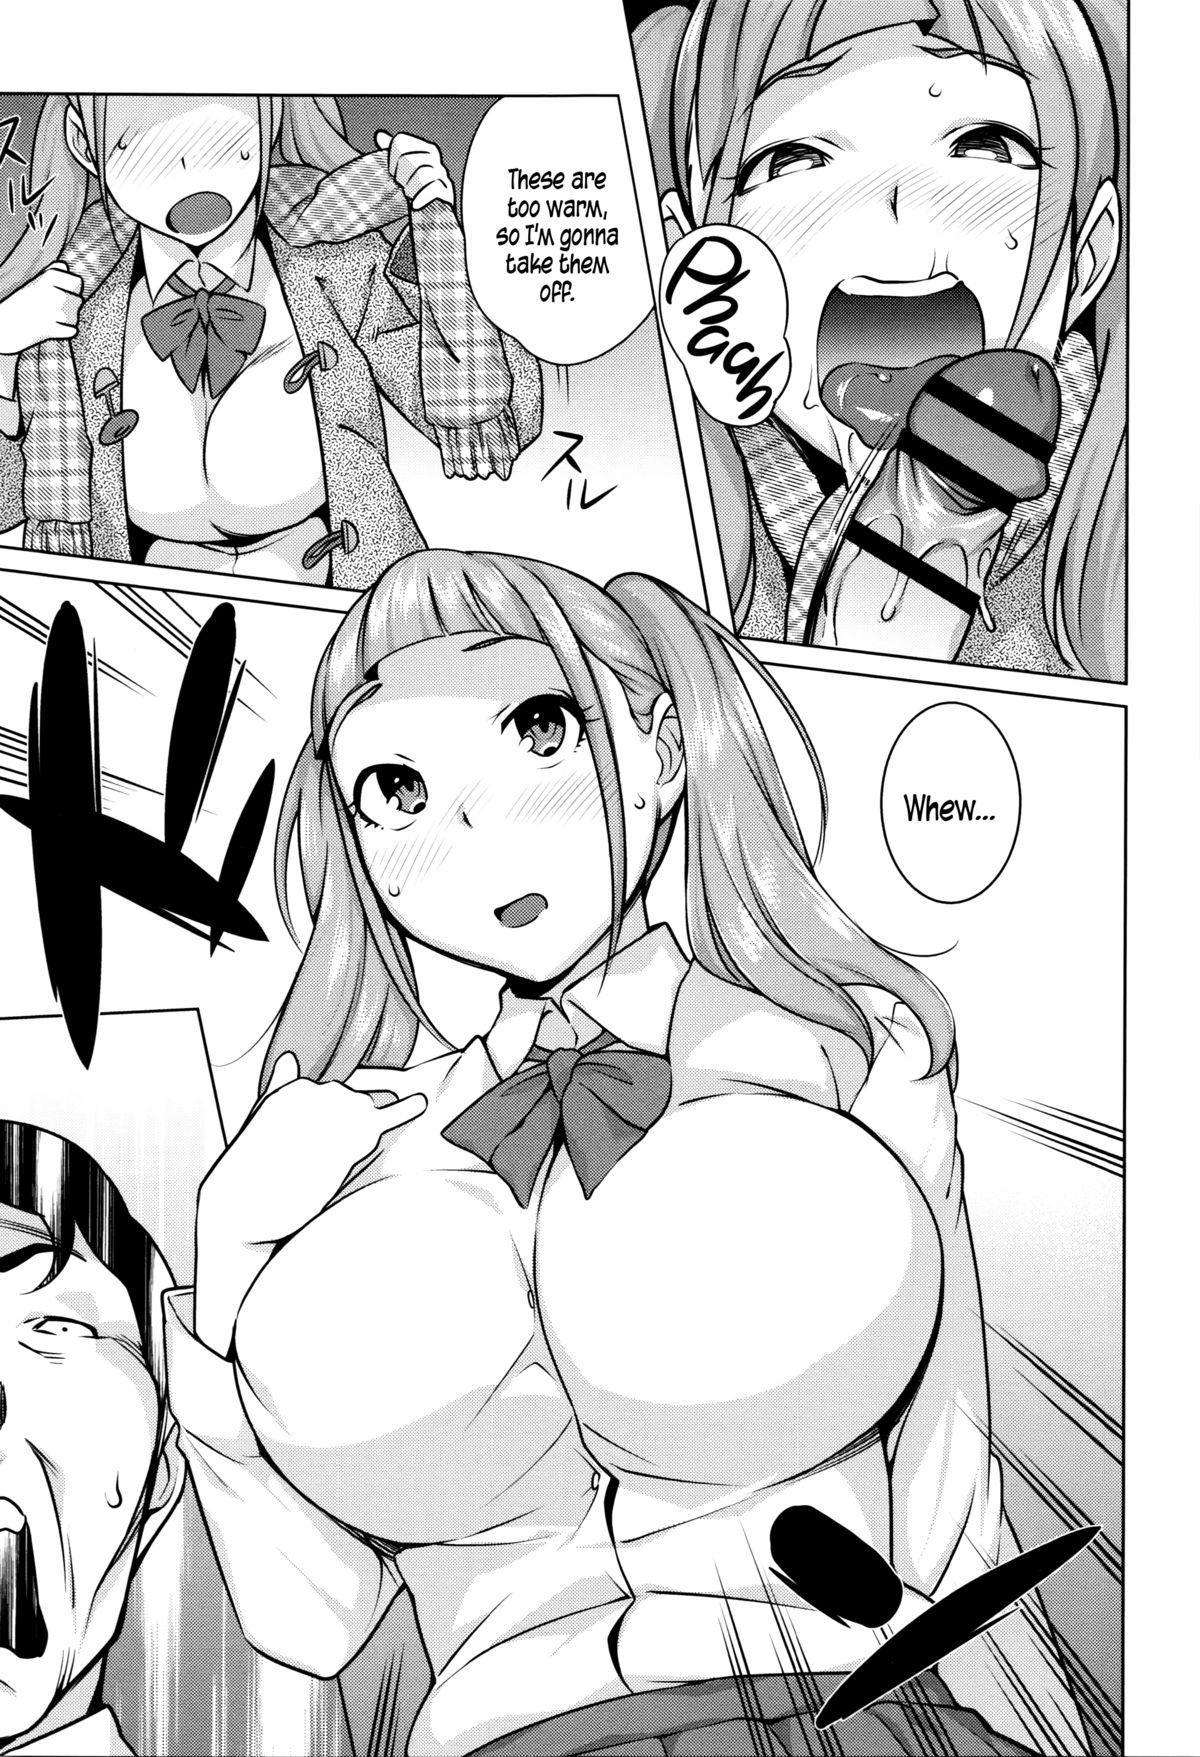 Hatsujou! Namaiki JK | Horny! Cheeky JK 99